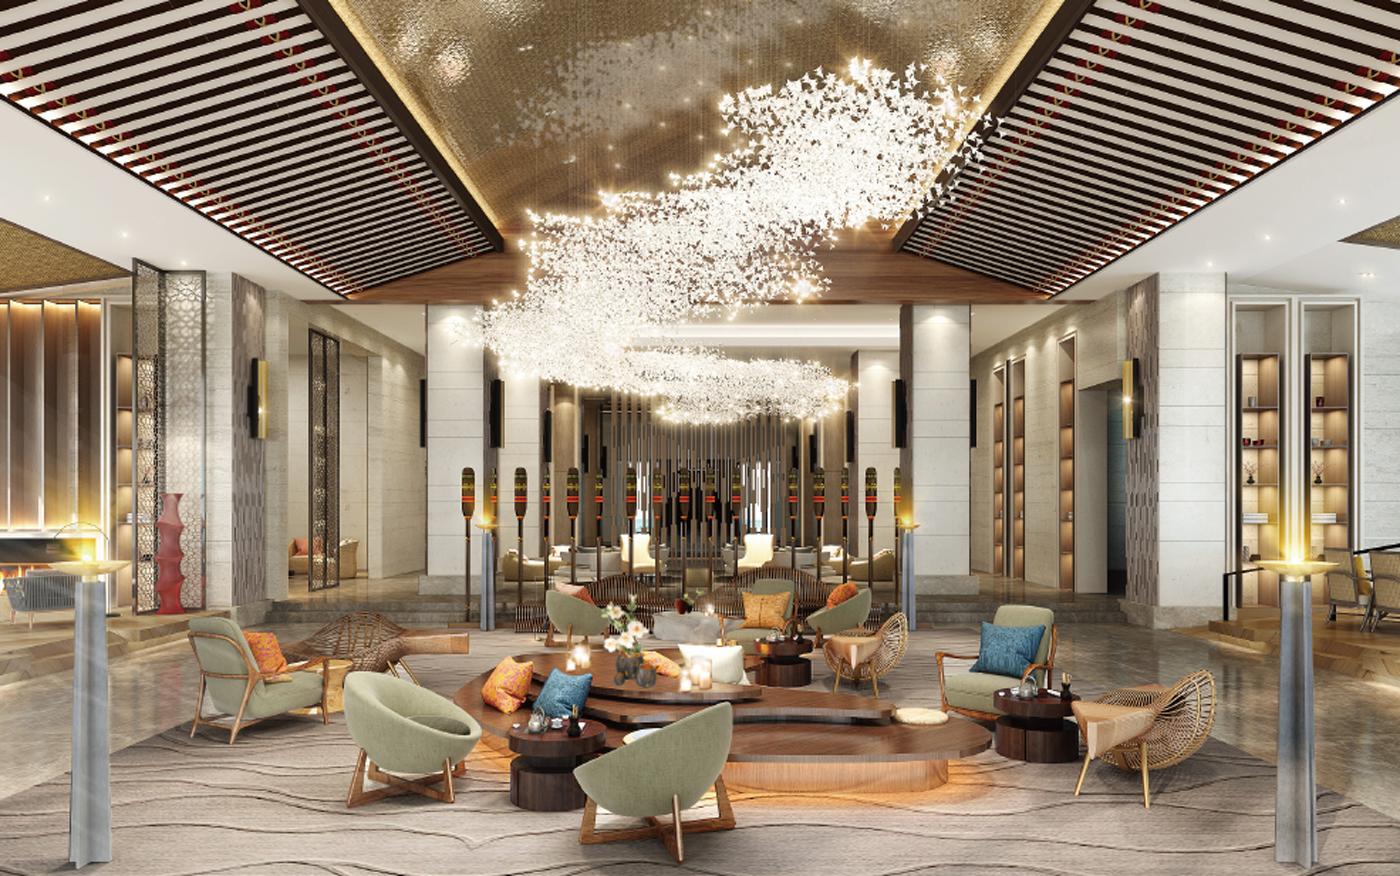 Doubletree-By-Hilton-Resort-_web_2